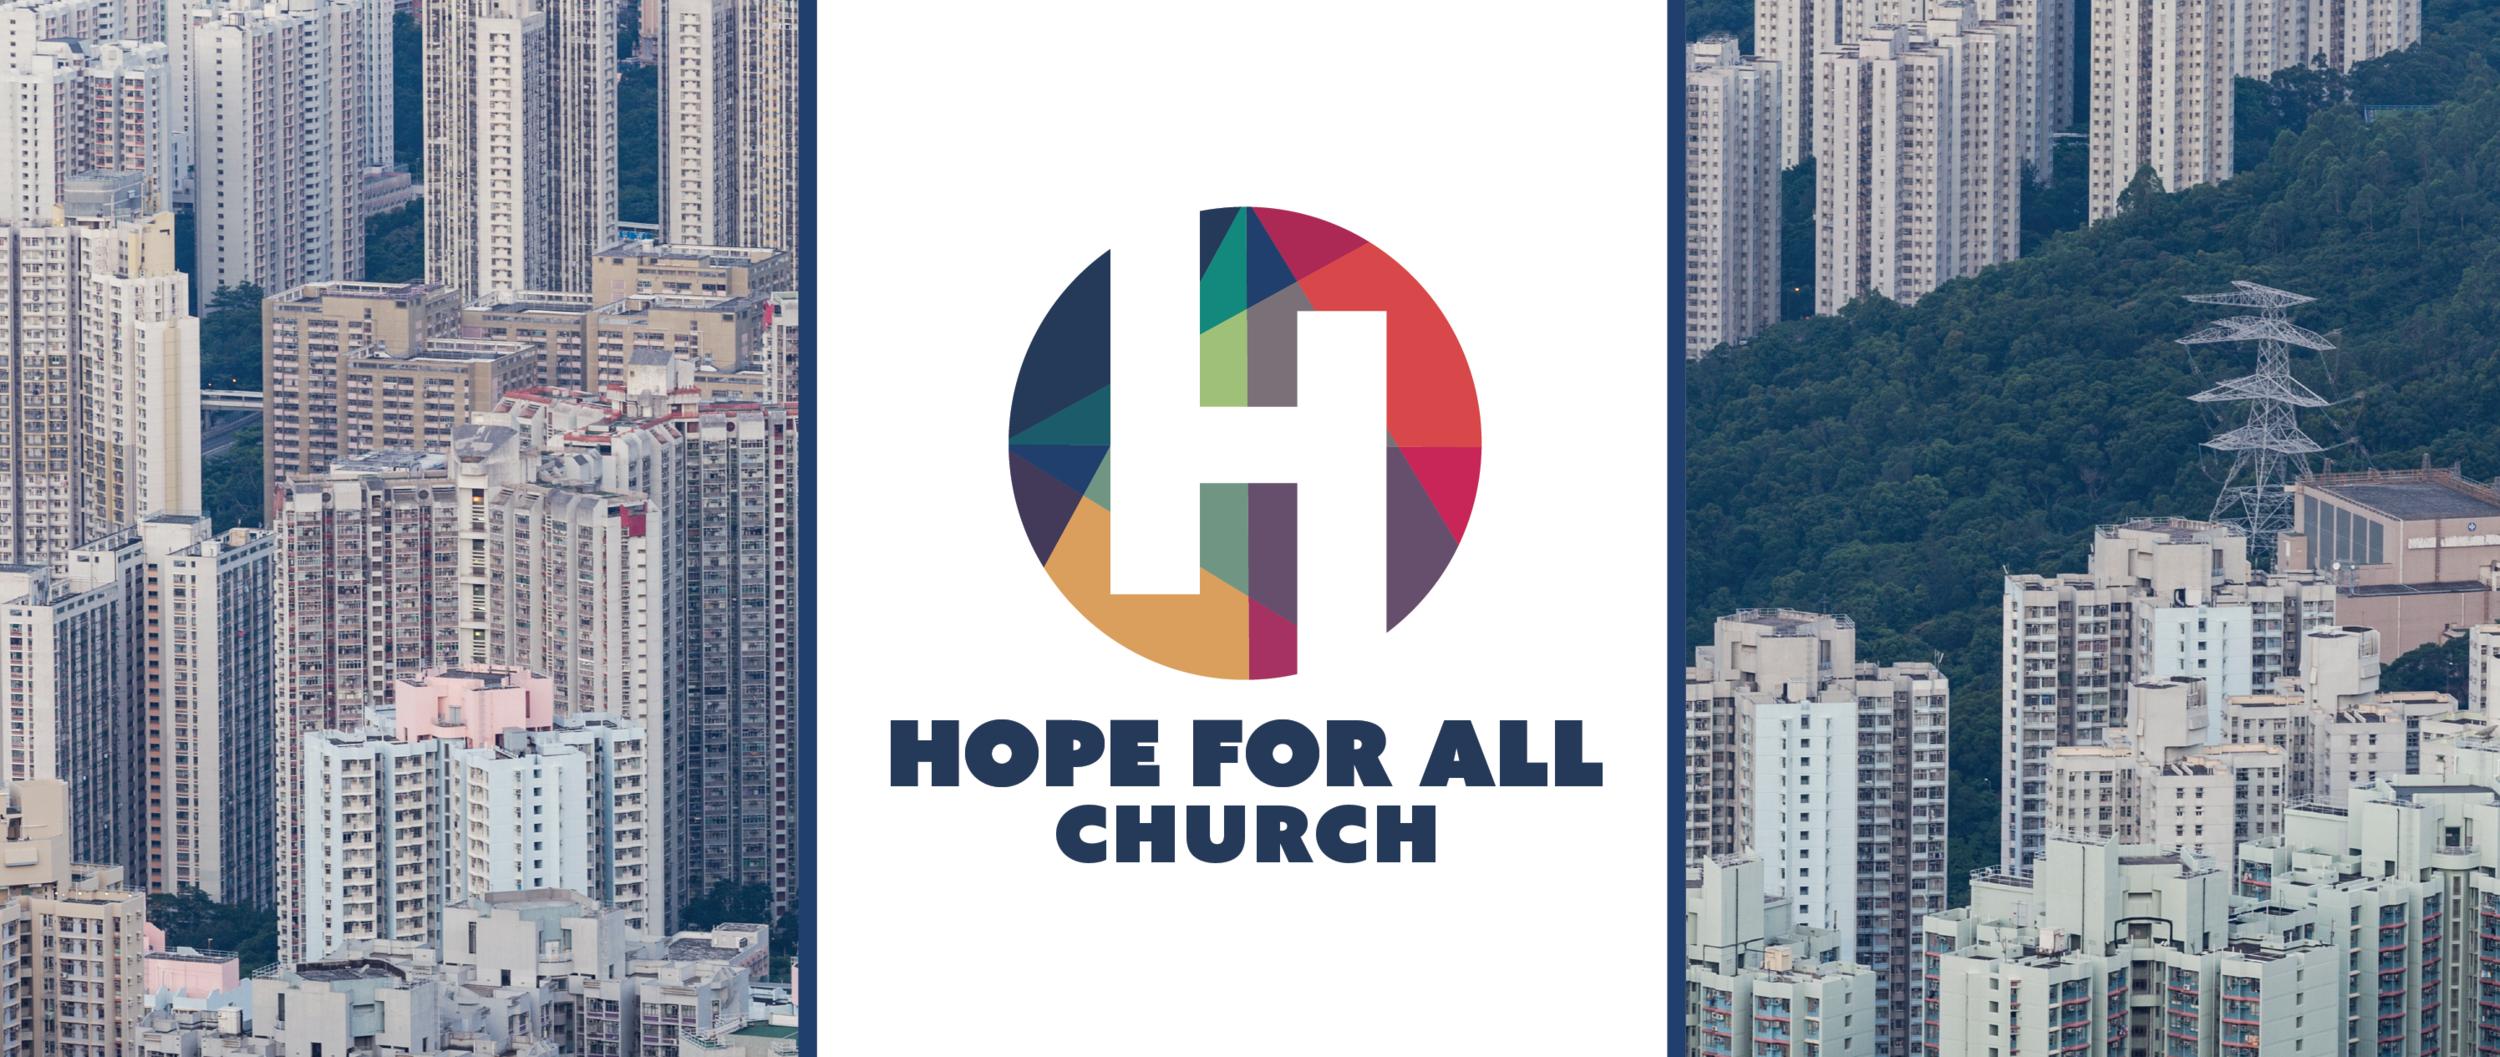 HopeForAllChurch-Banner-15.png